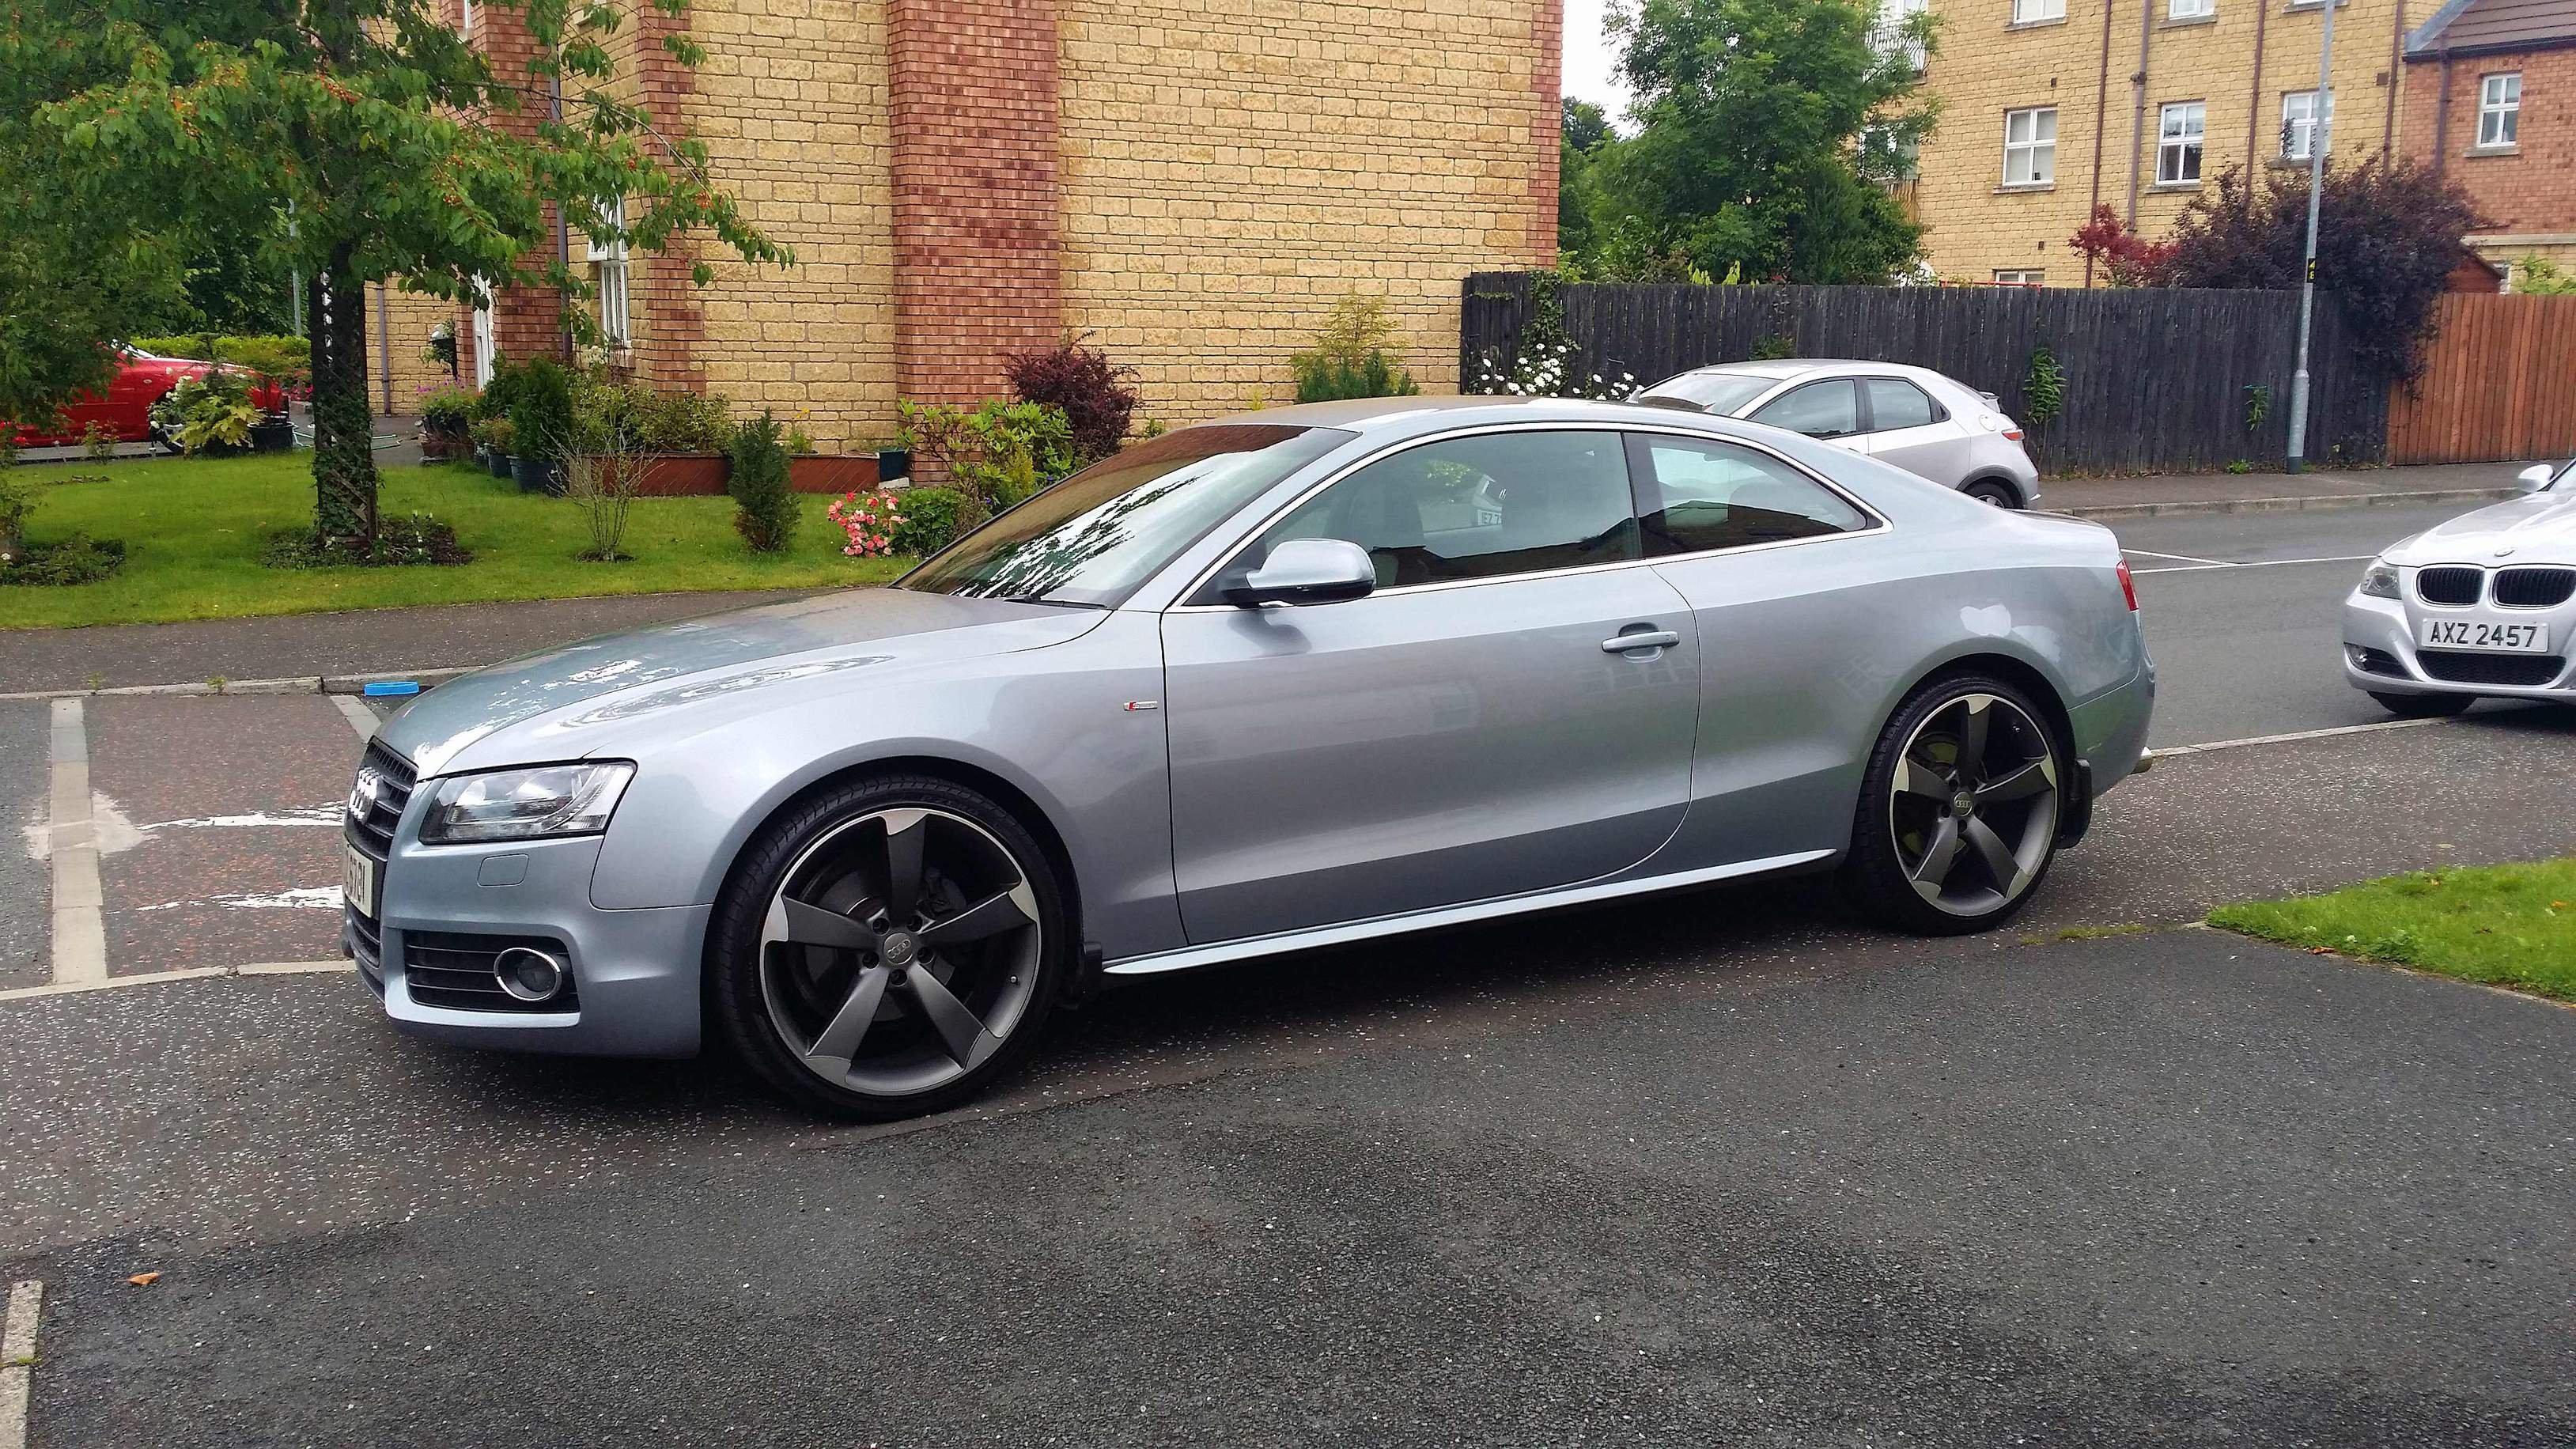 prestige for vehicles audiworld a img audi forums sale